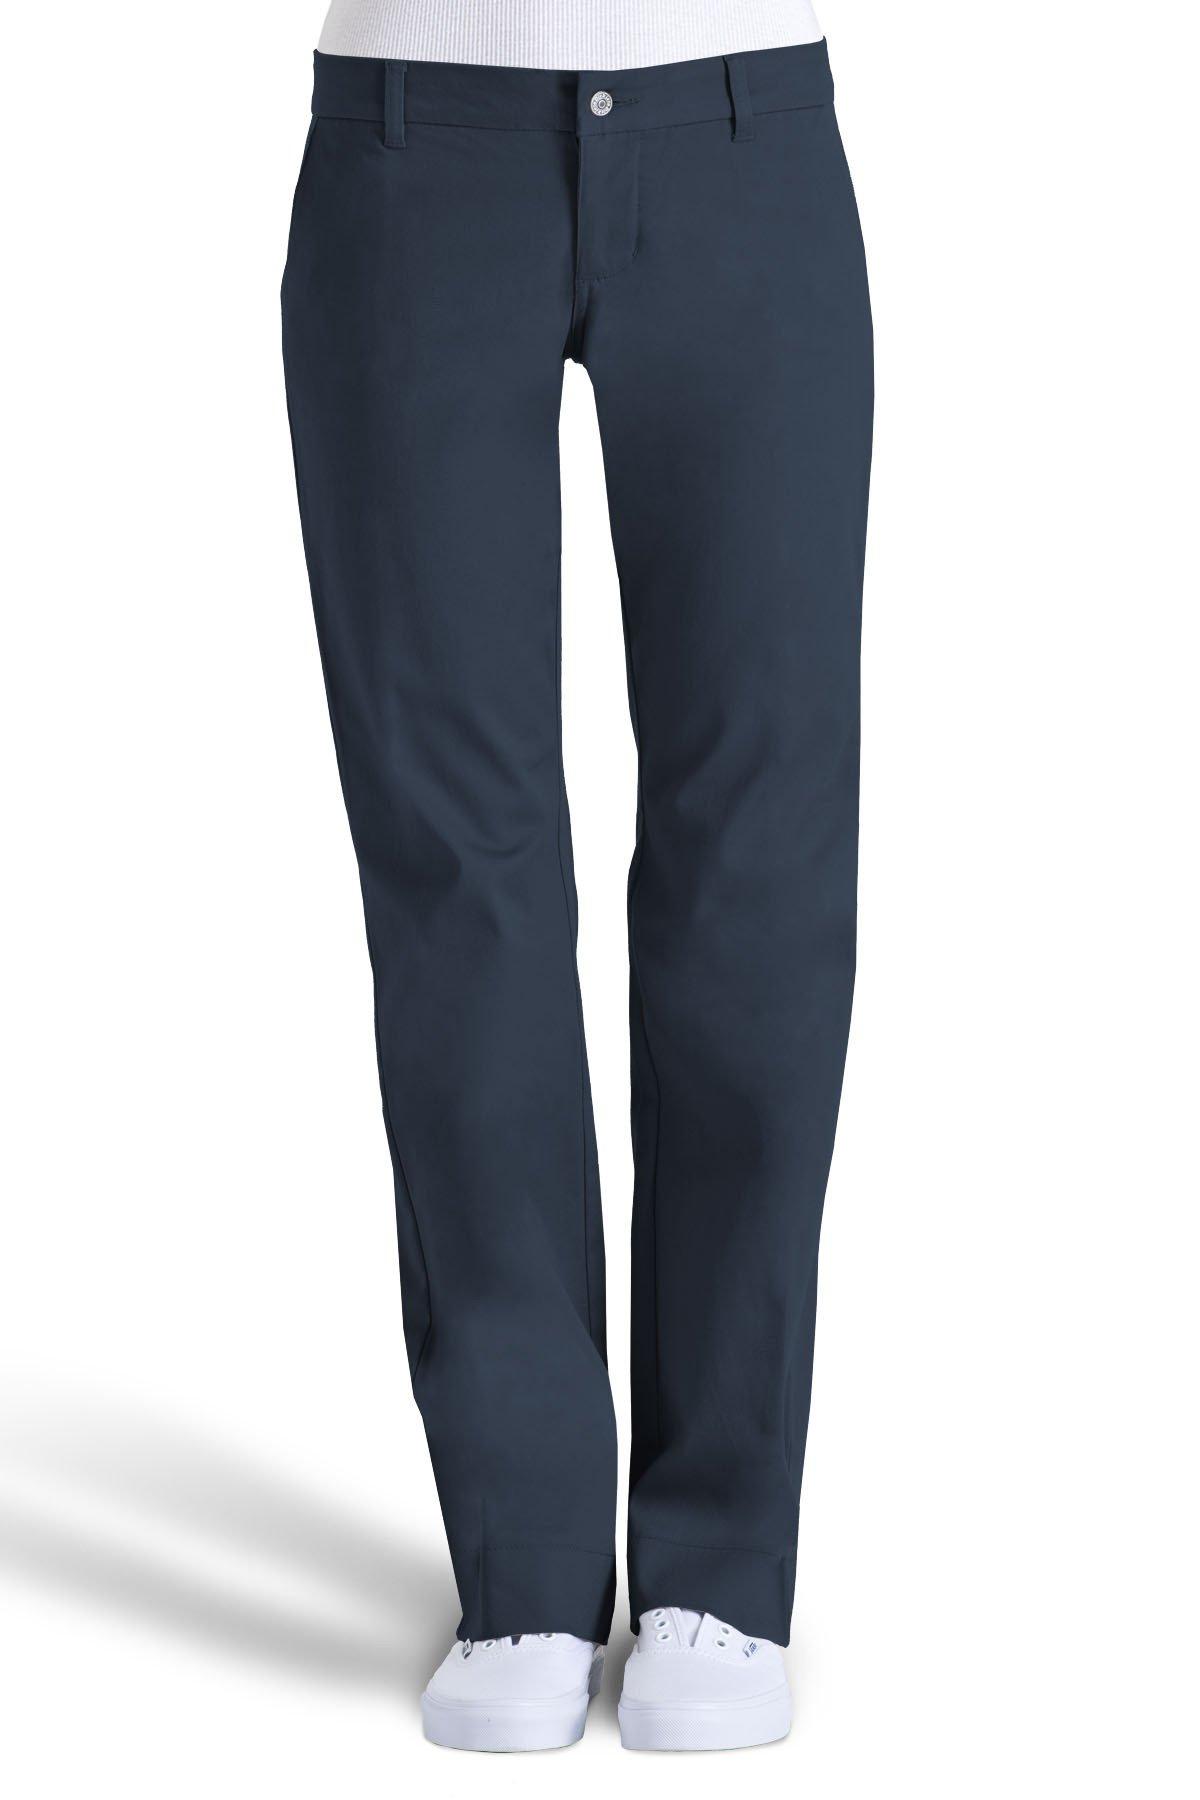 Dickies Girls Juniors' Bull 4-Pocket Bootcut Pant-School Uniform,Dark Navy,7